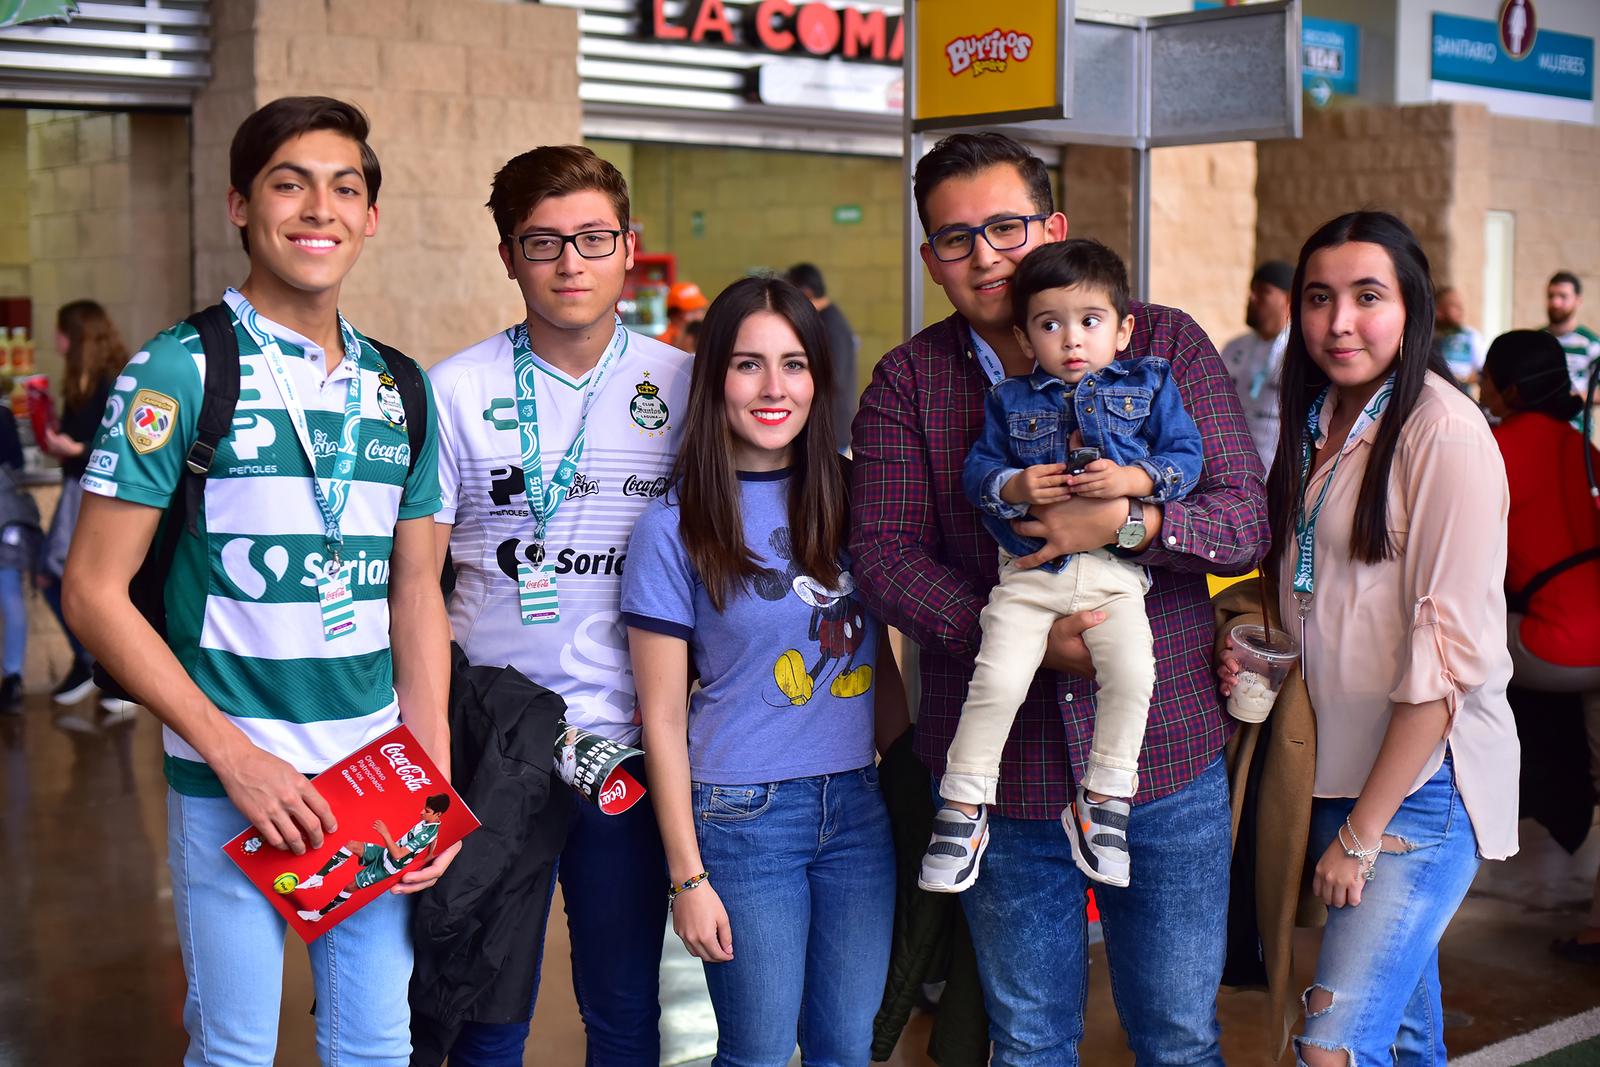 Raúl, Diego, Génesis, Óscar, Nessim y Angie.